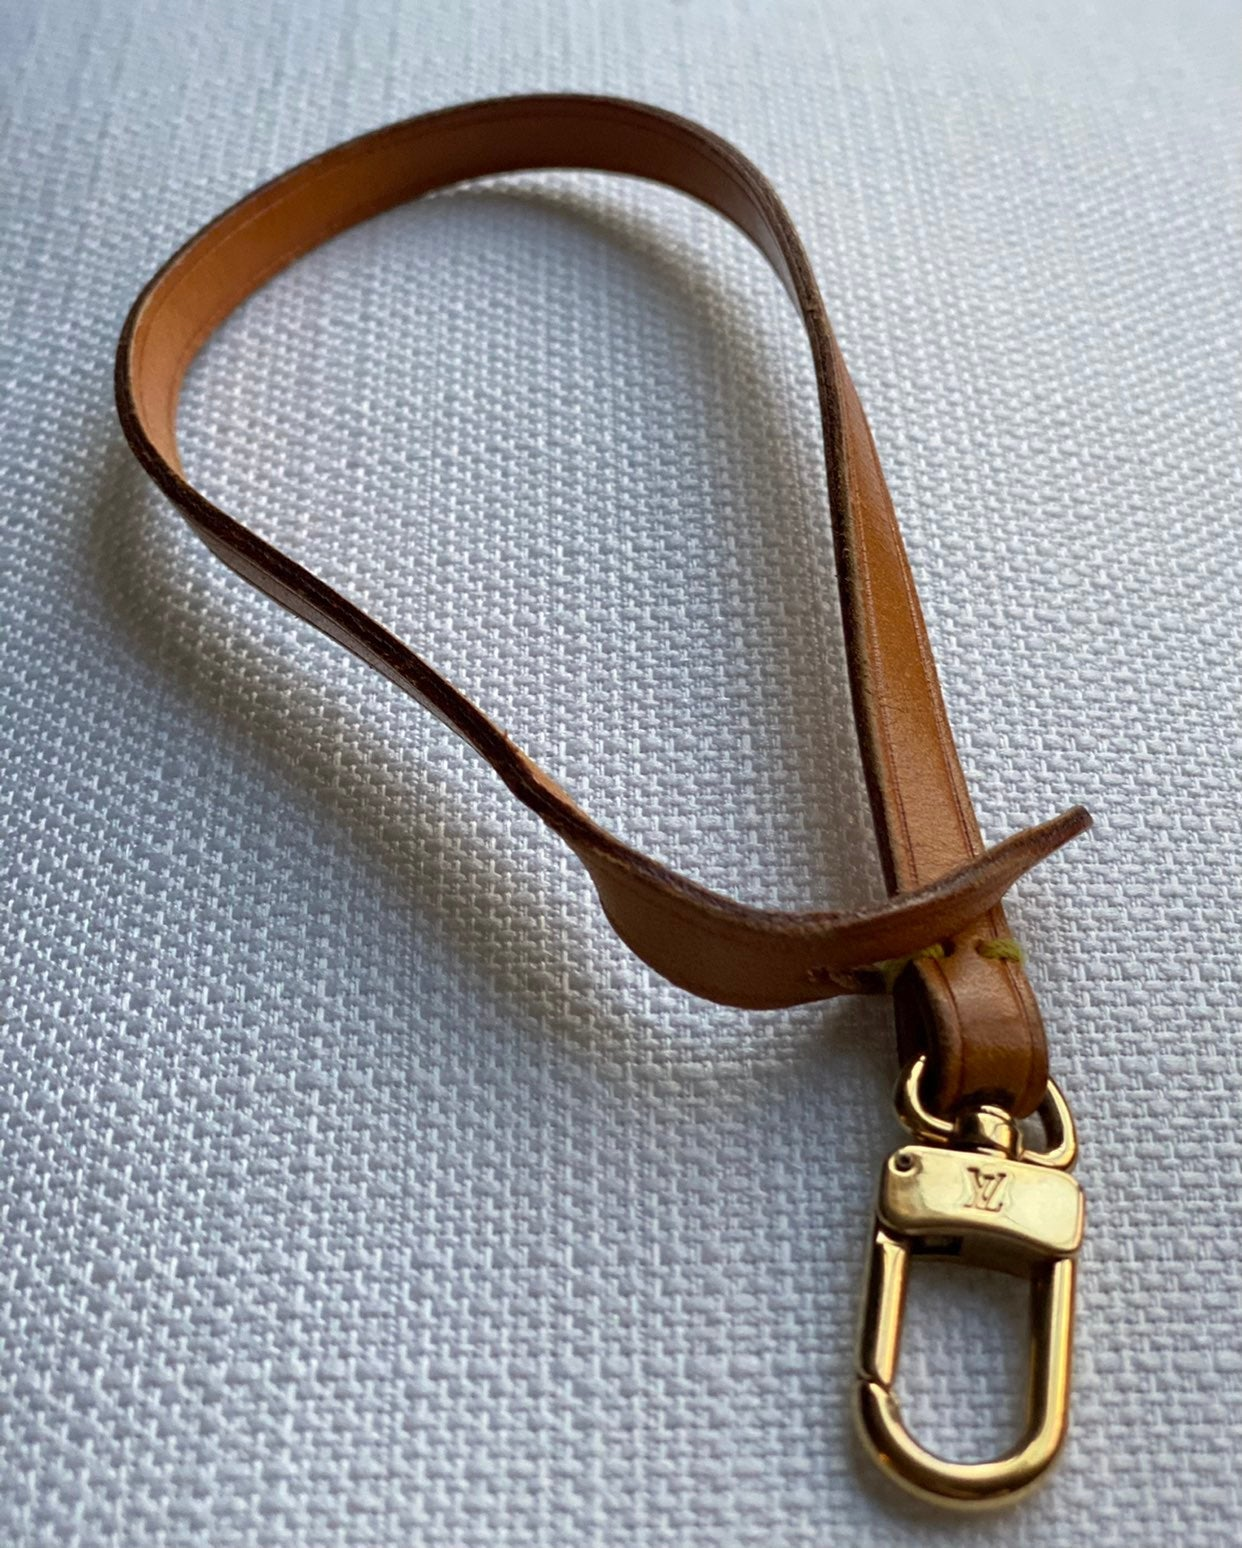 Louis Vuitton Wristet Vachetta Strap